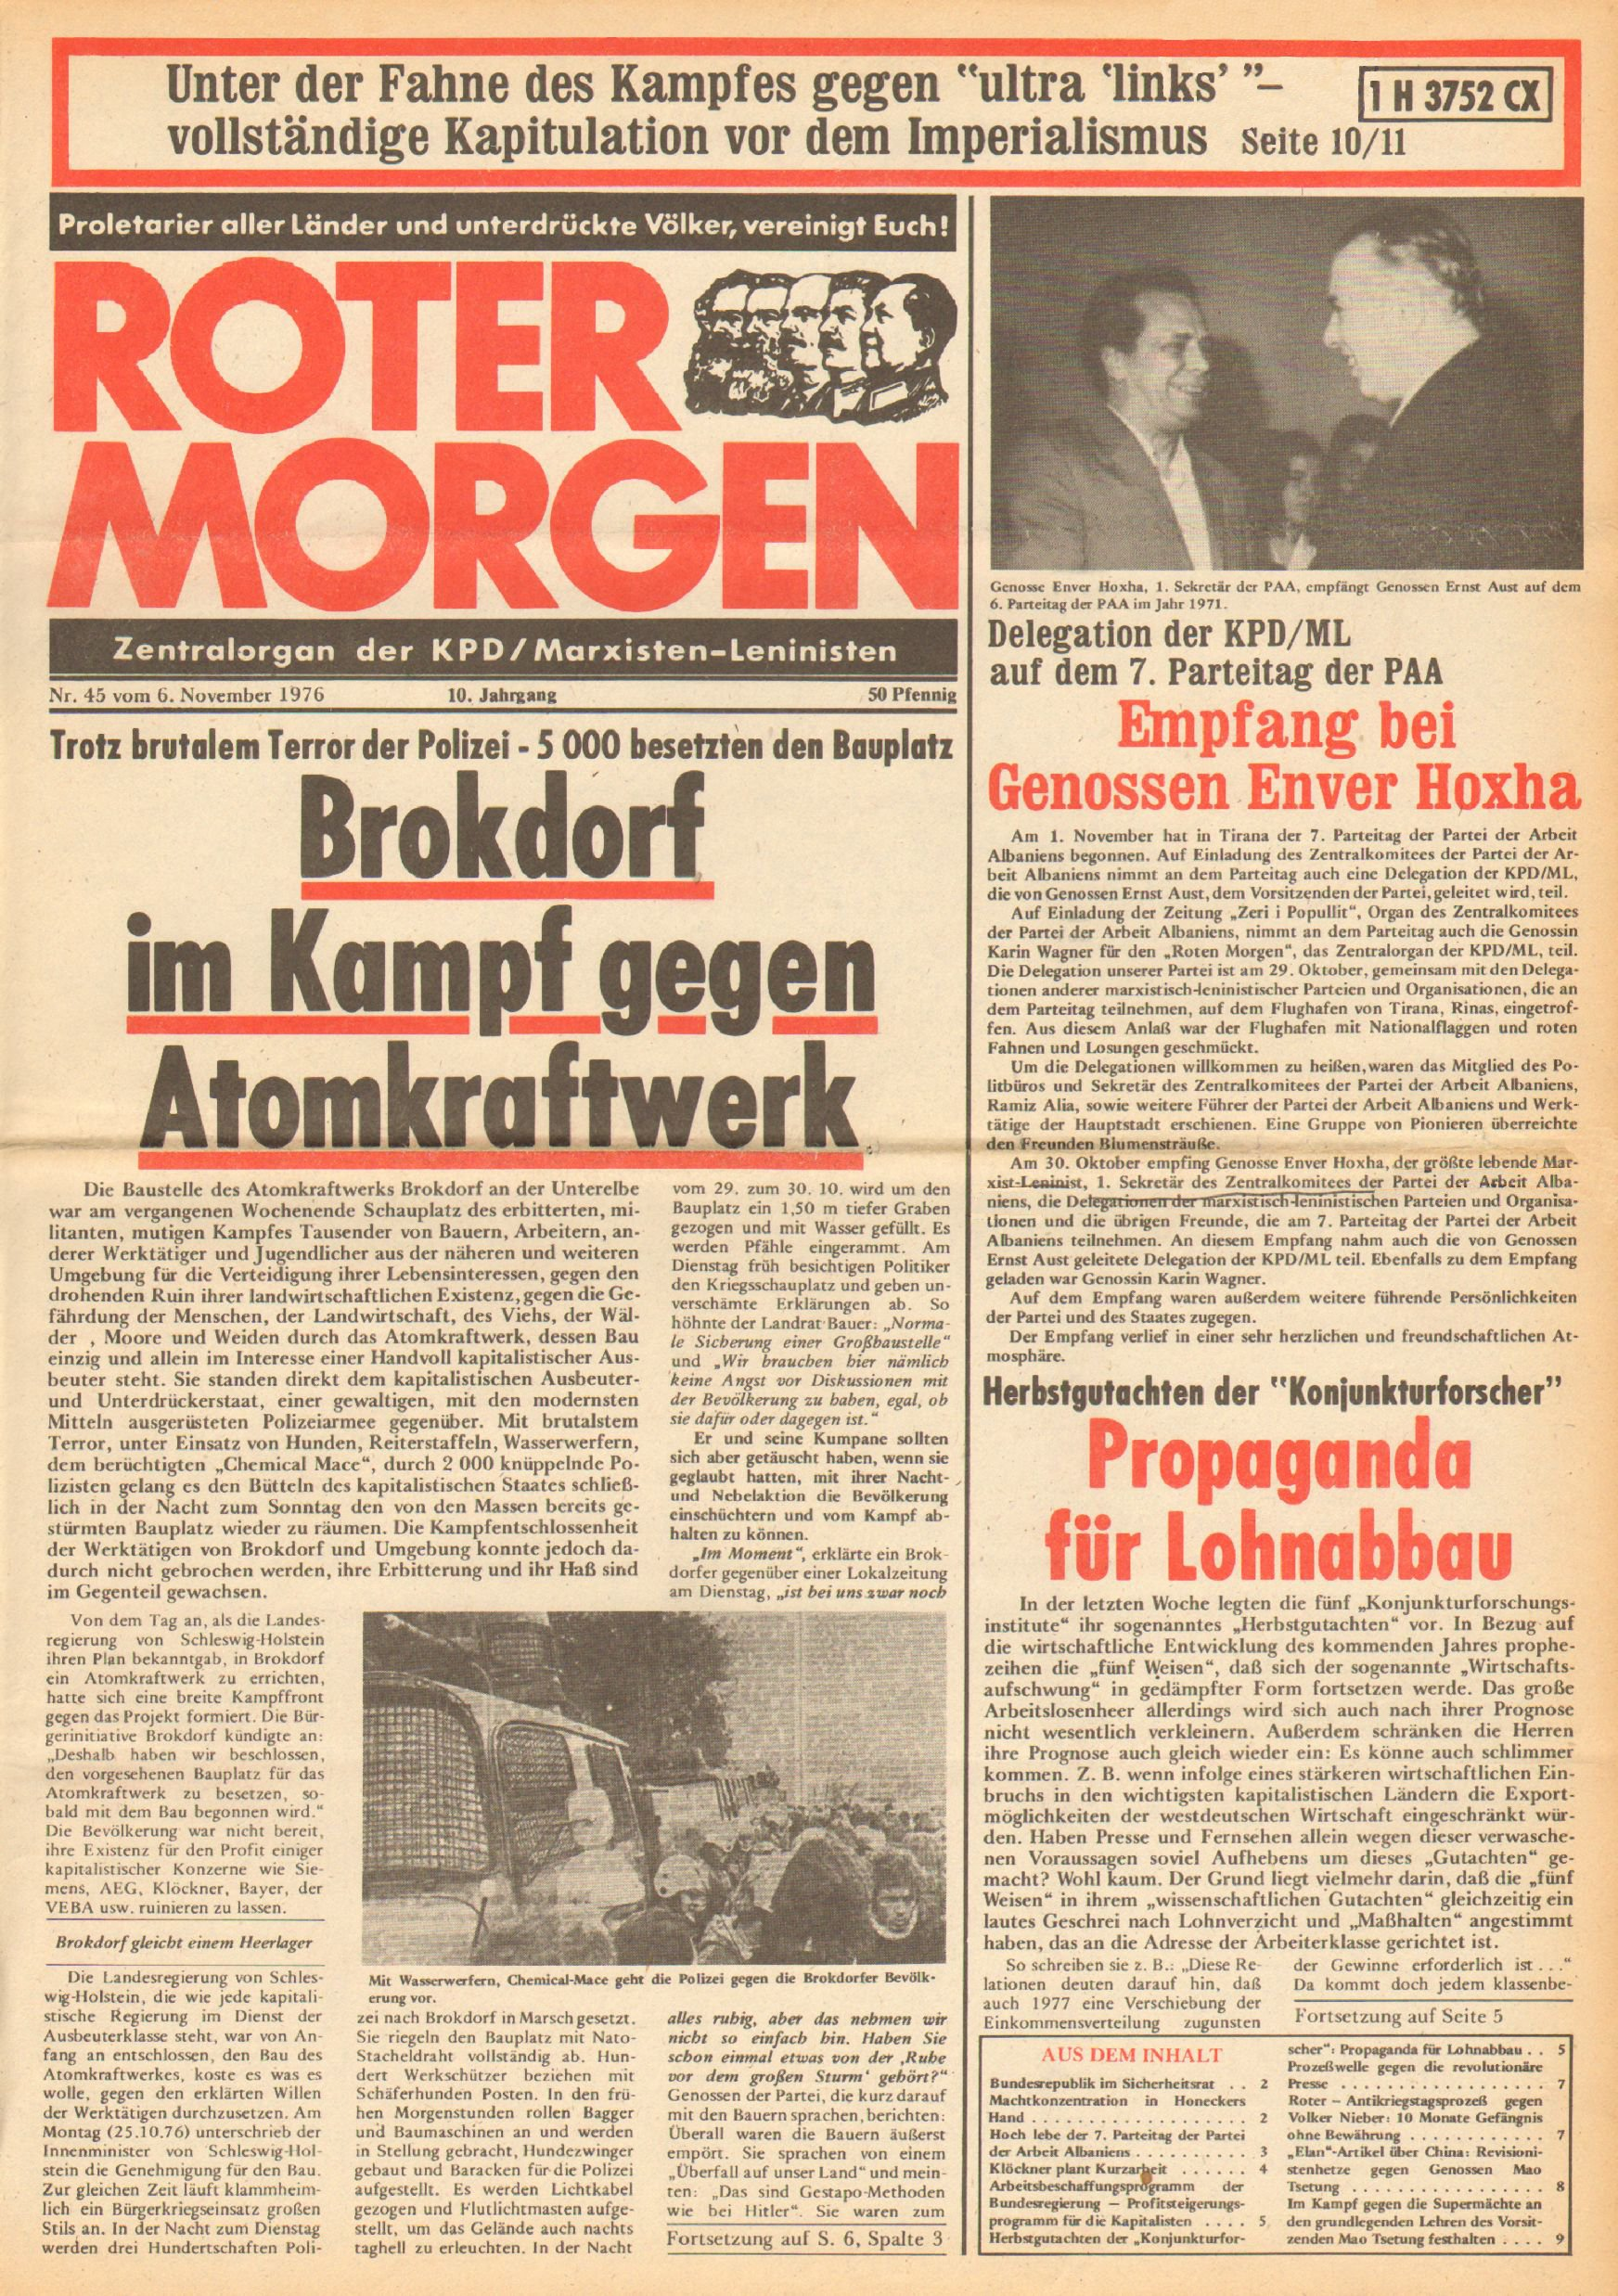 Roter Morgen, 10. Jg., 6. November 1976, Nr. 45, Seite 1